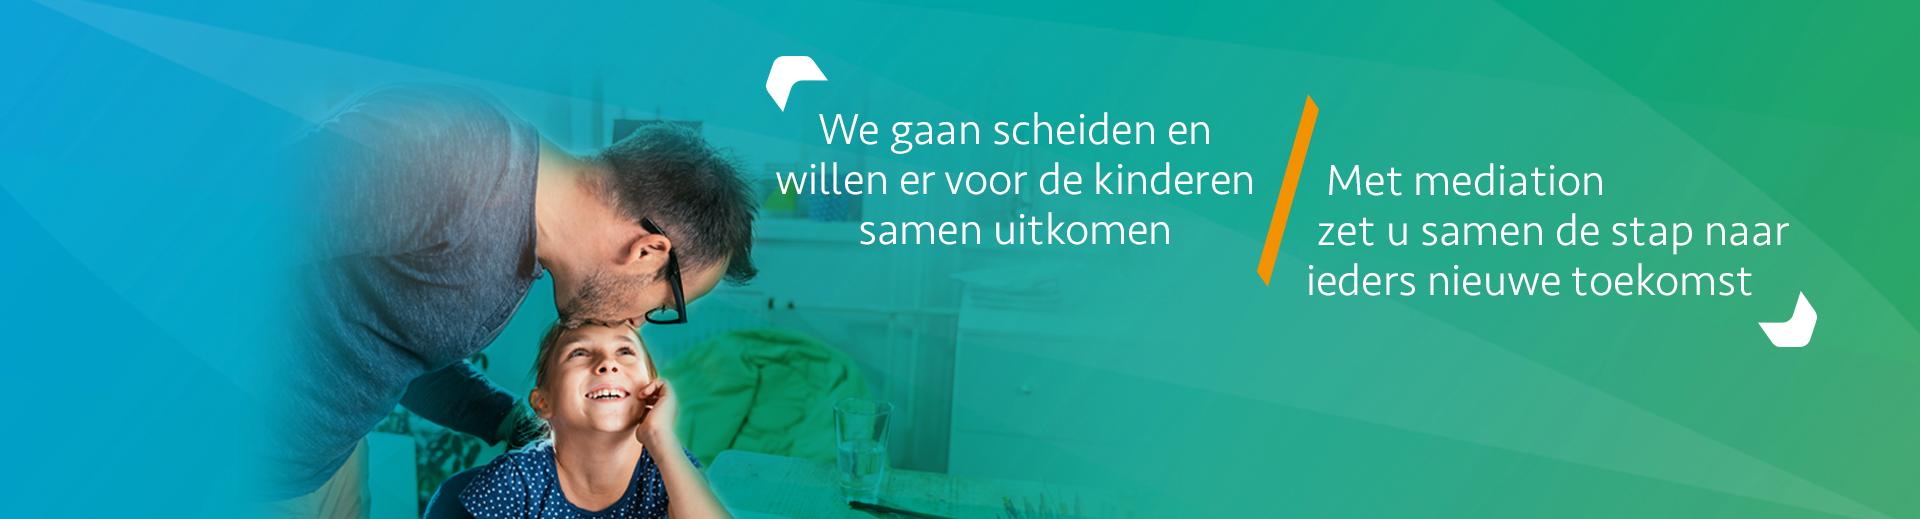 Mediation - Scheidingsplanner Hoofddorp - Badhoevedorp - Nieuw Vennep